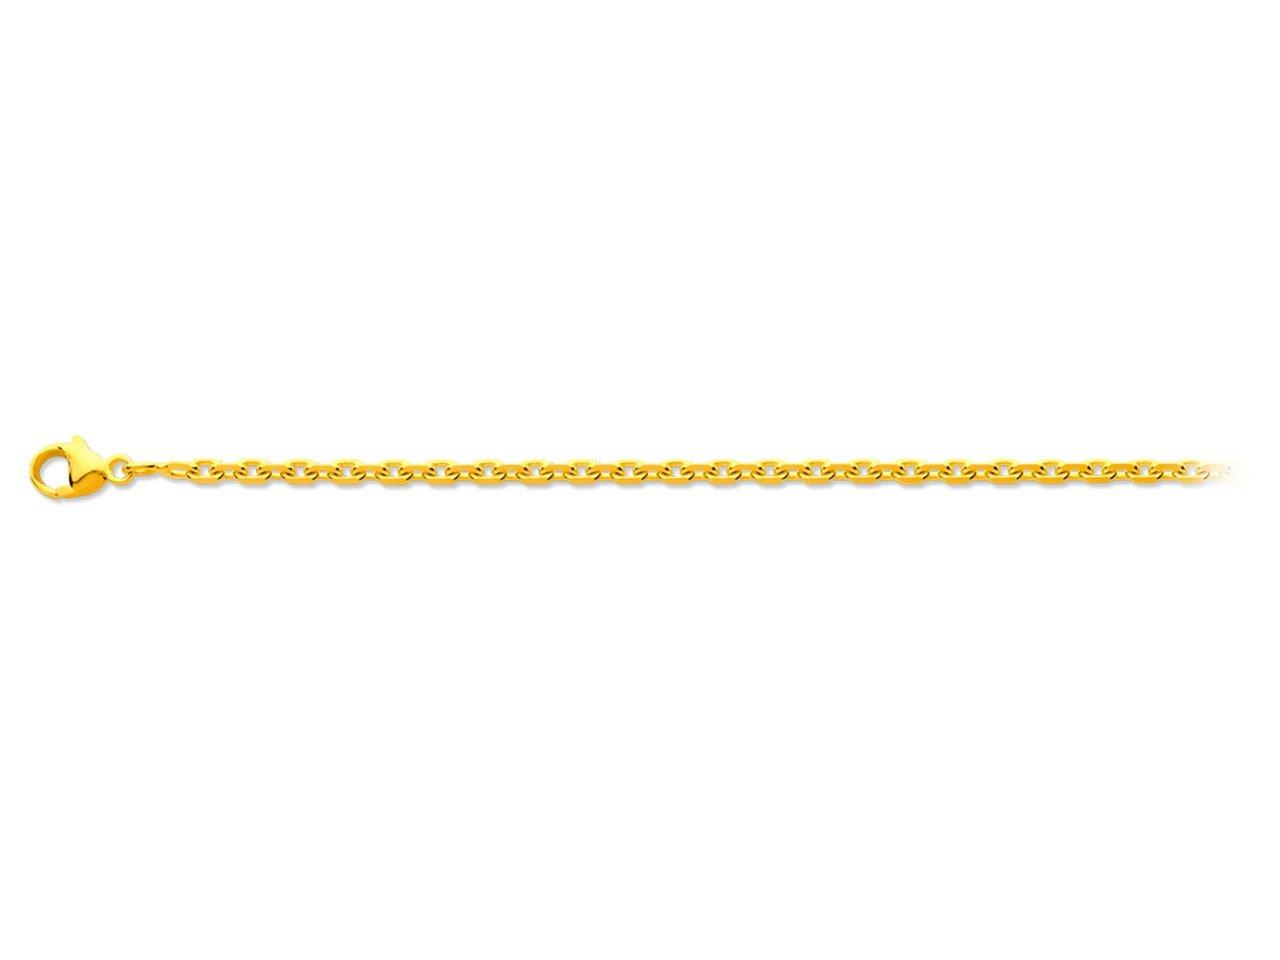 Chaîne maille forçat en or jaune - 50 cm